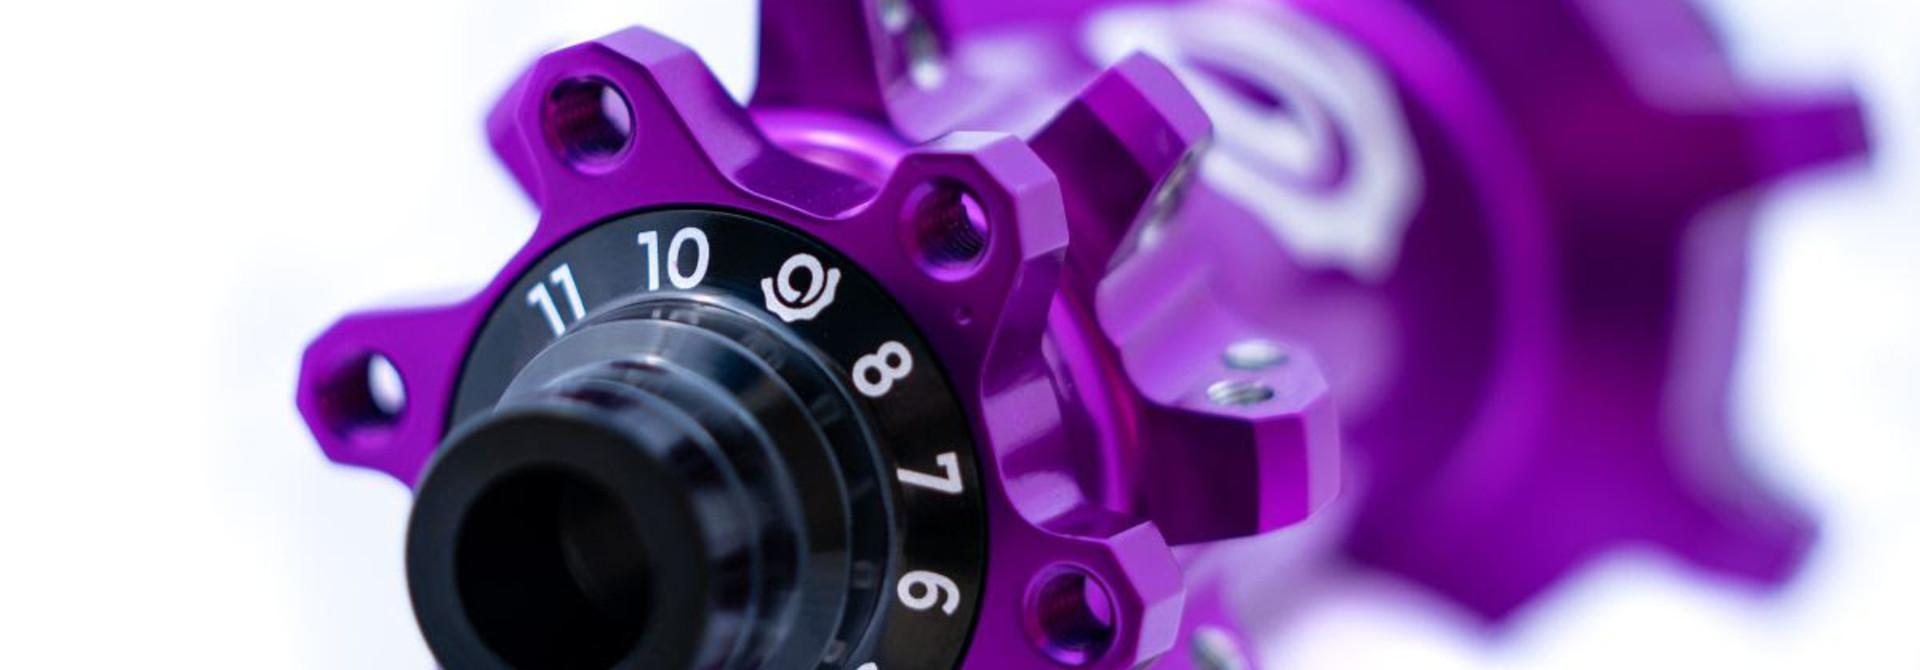 Industry Nine Frequency Adjust Ratchet Technology Knob